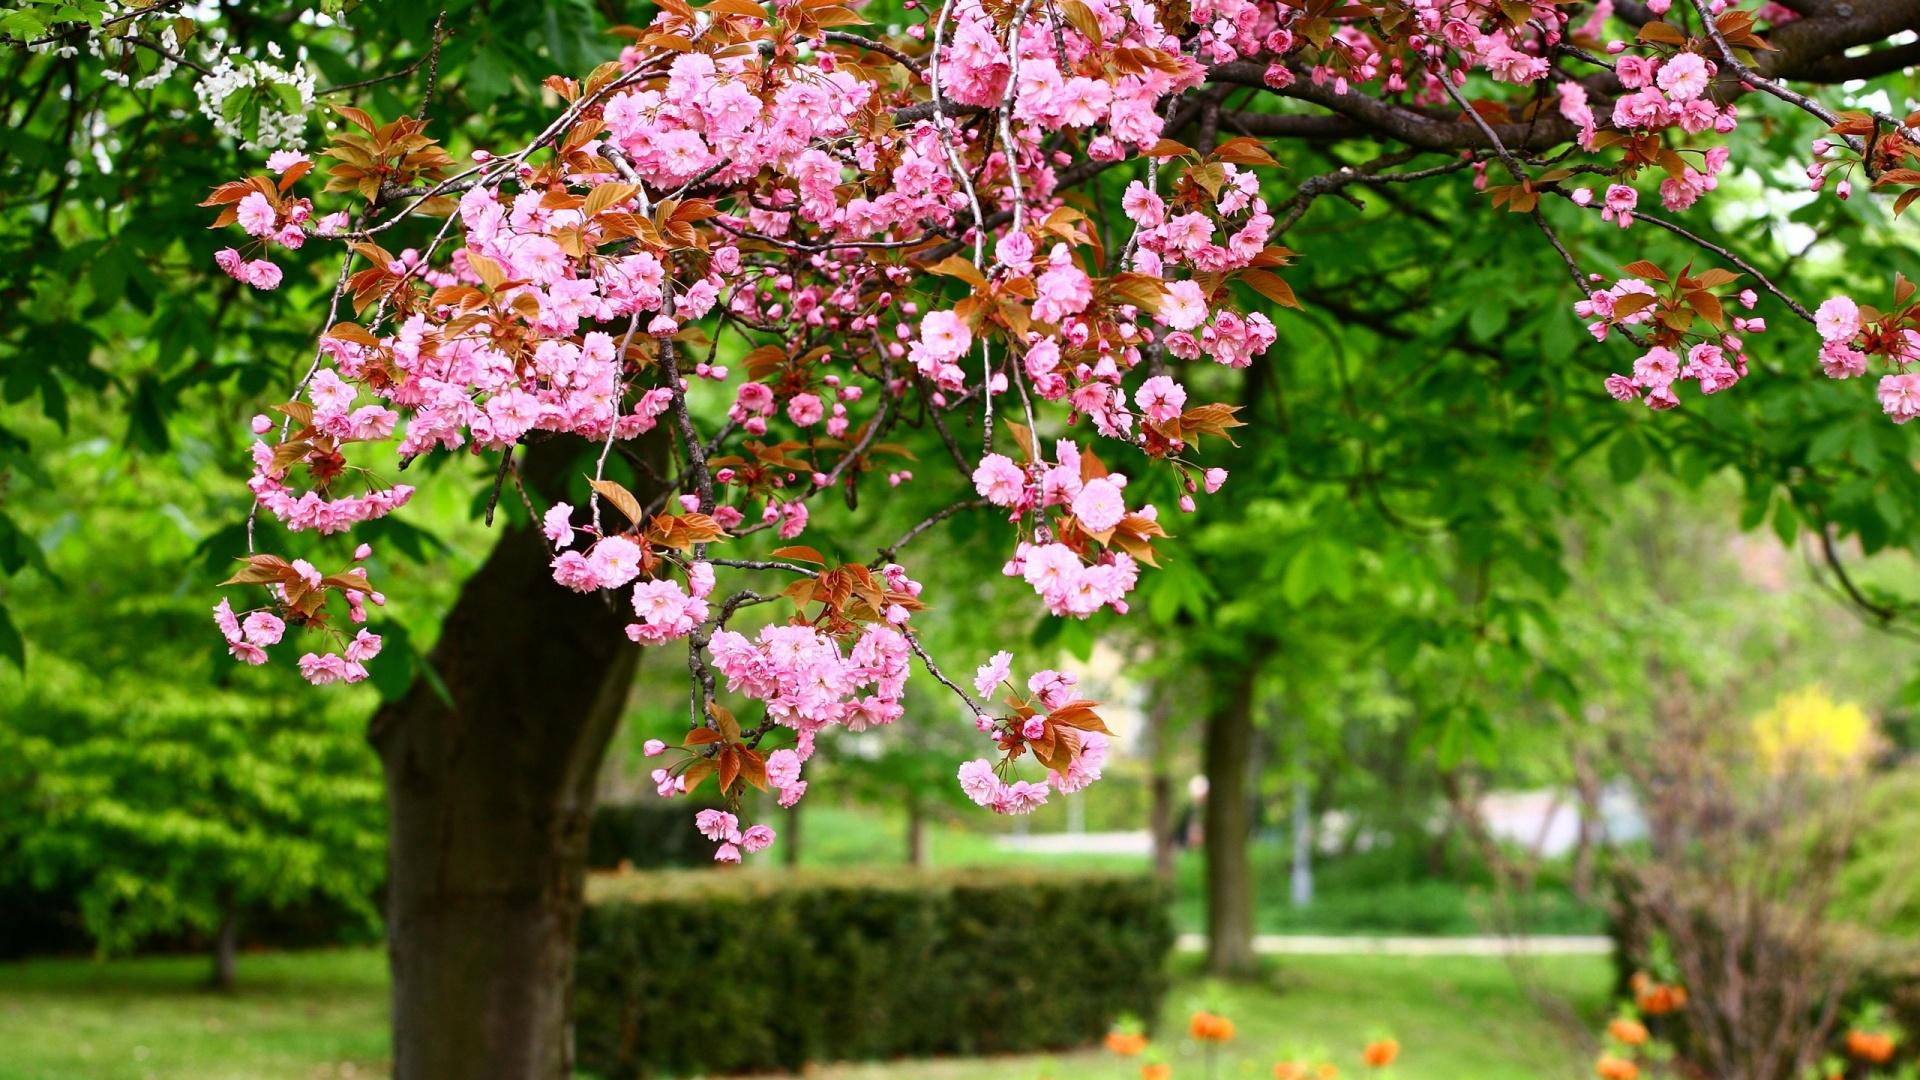 Spring flowers wallpaper desktop best spring flowers images 1920x1080 mightylinksfo